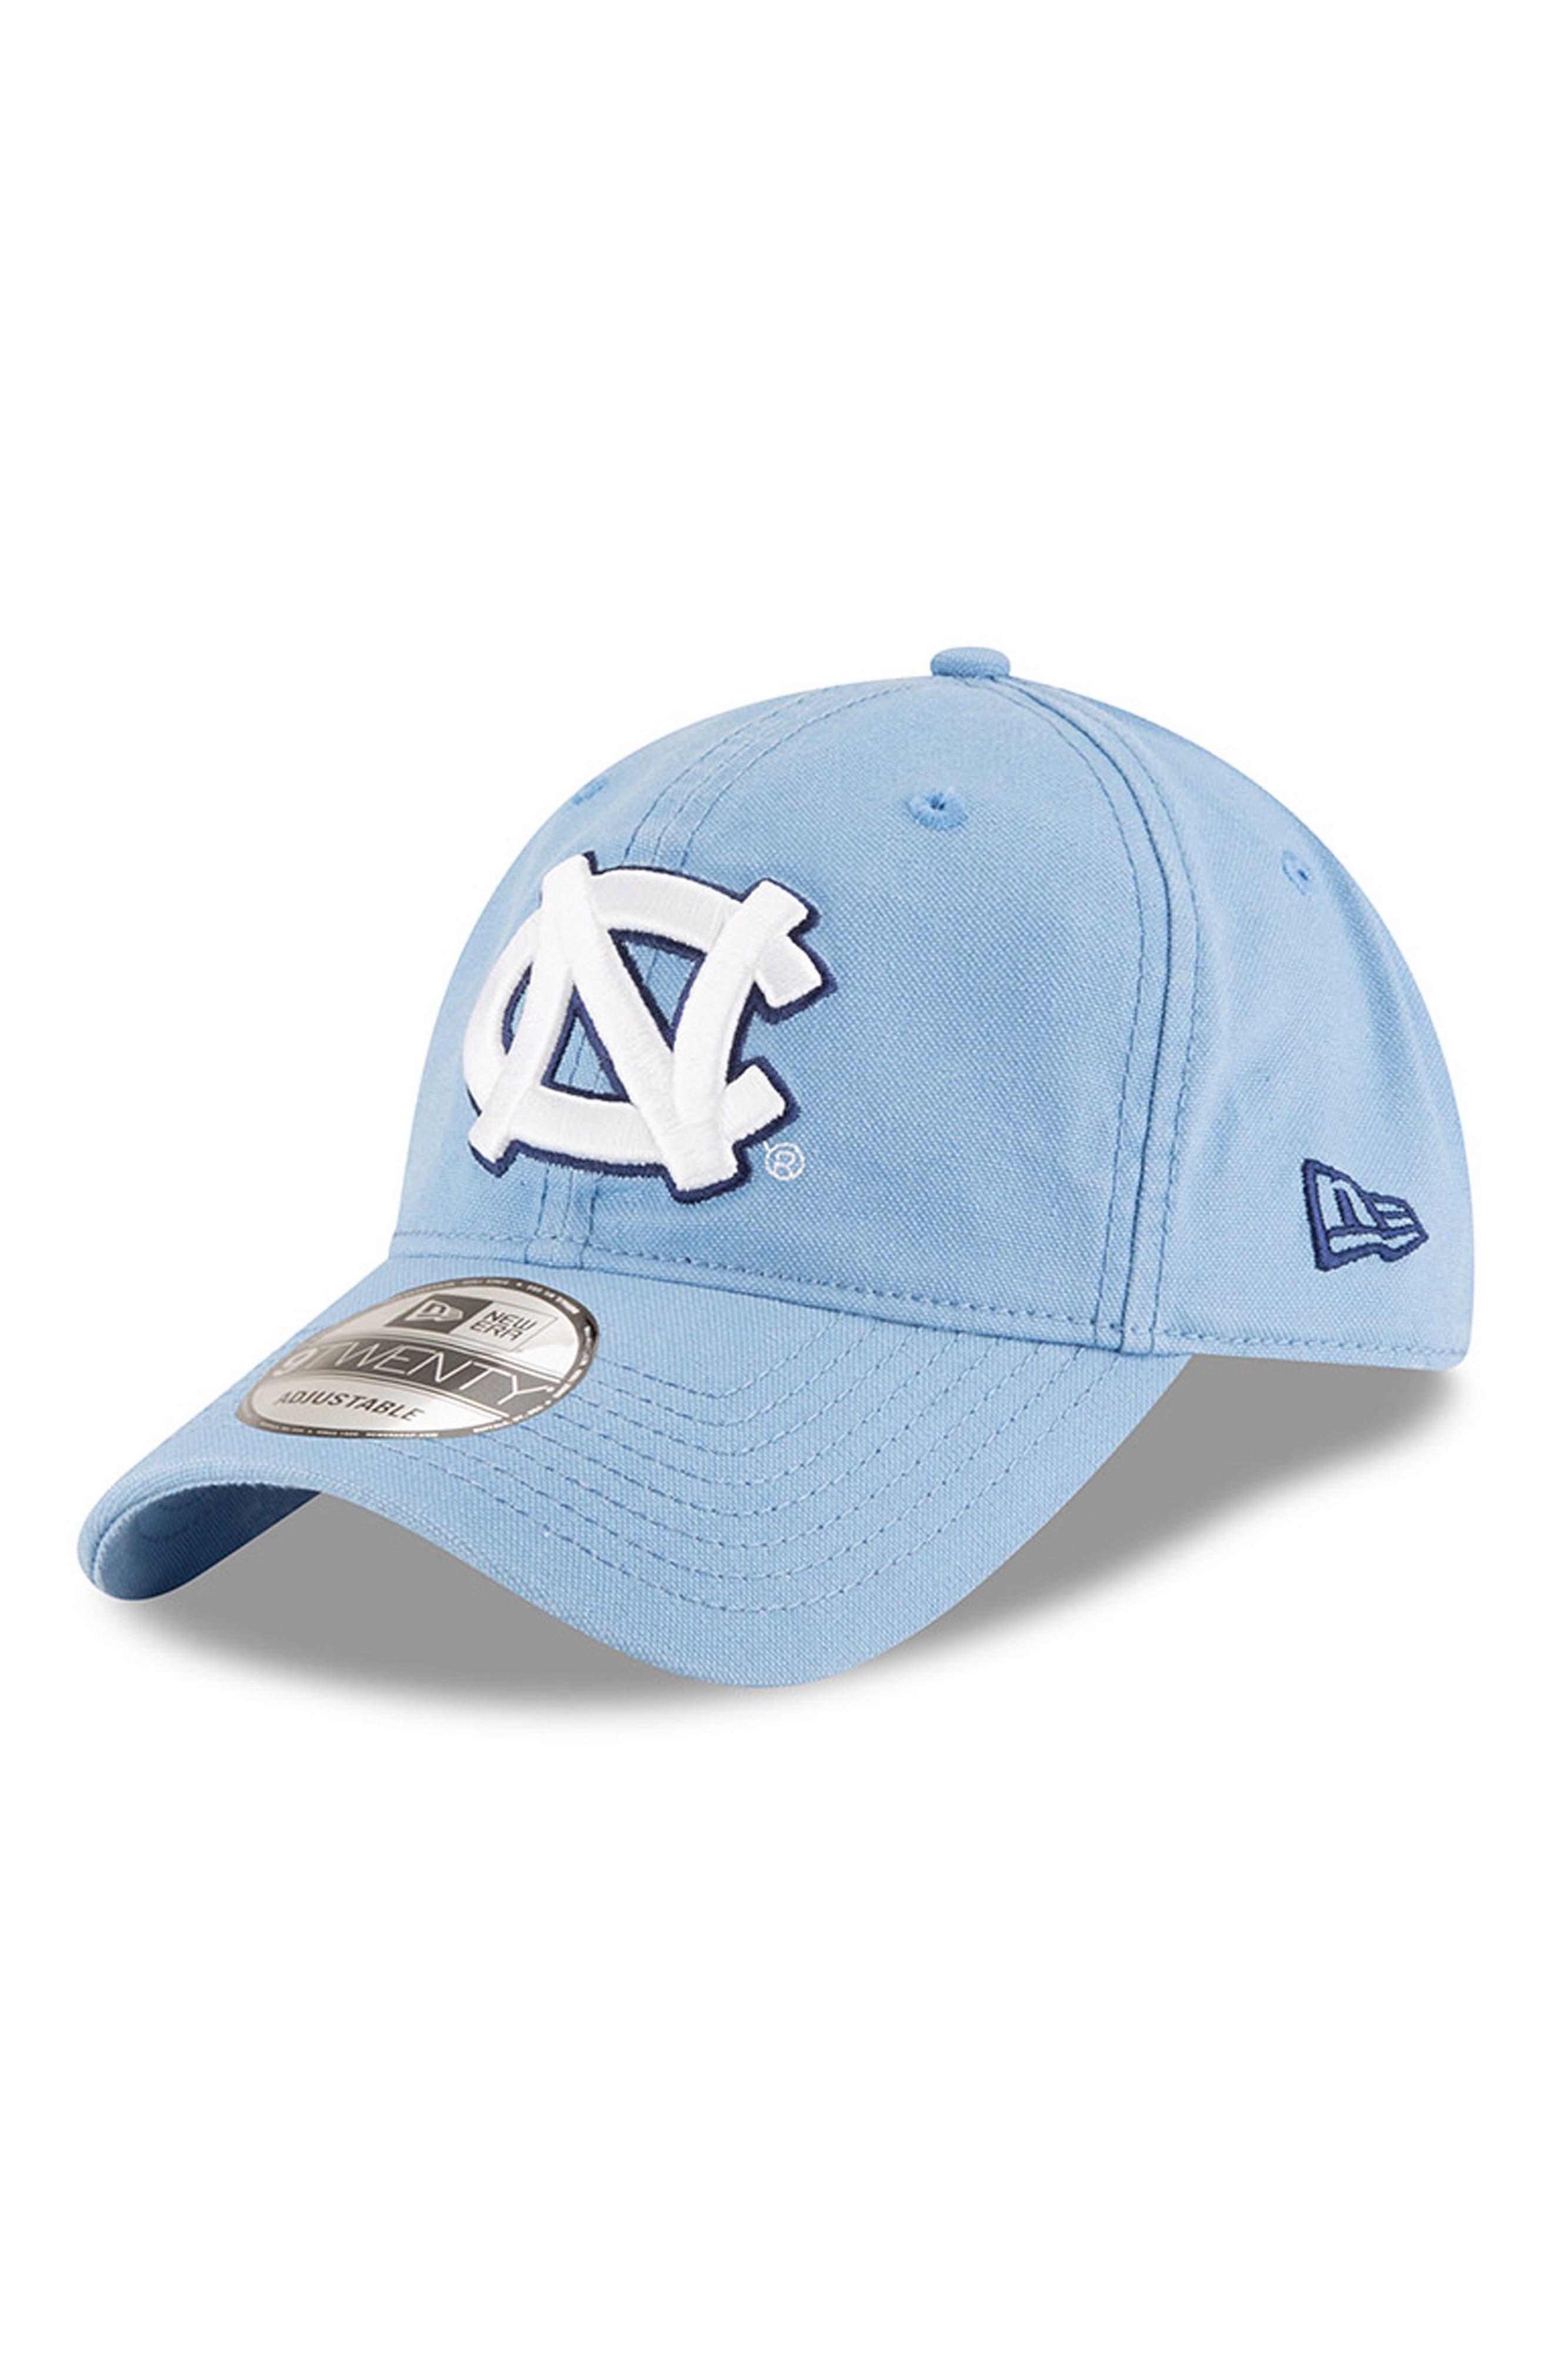 New Era Collegiate Core Classic - North Carolina Tar Heels Baseball Cap,                             Main thumbnail 1, color,                             450